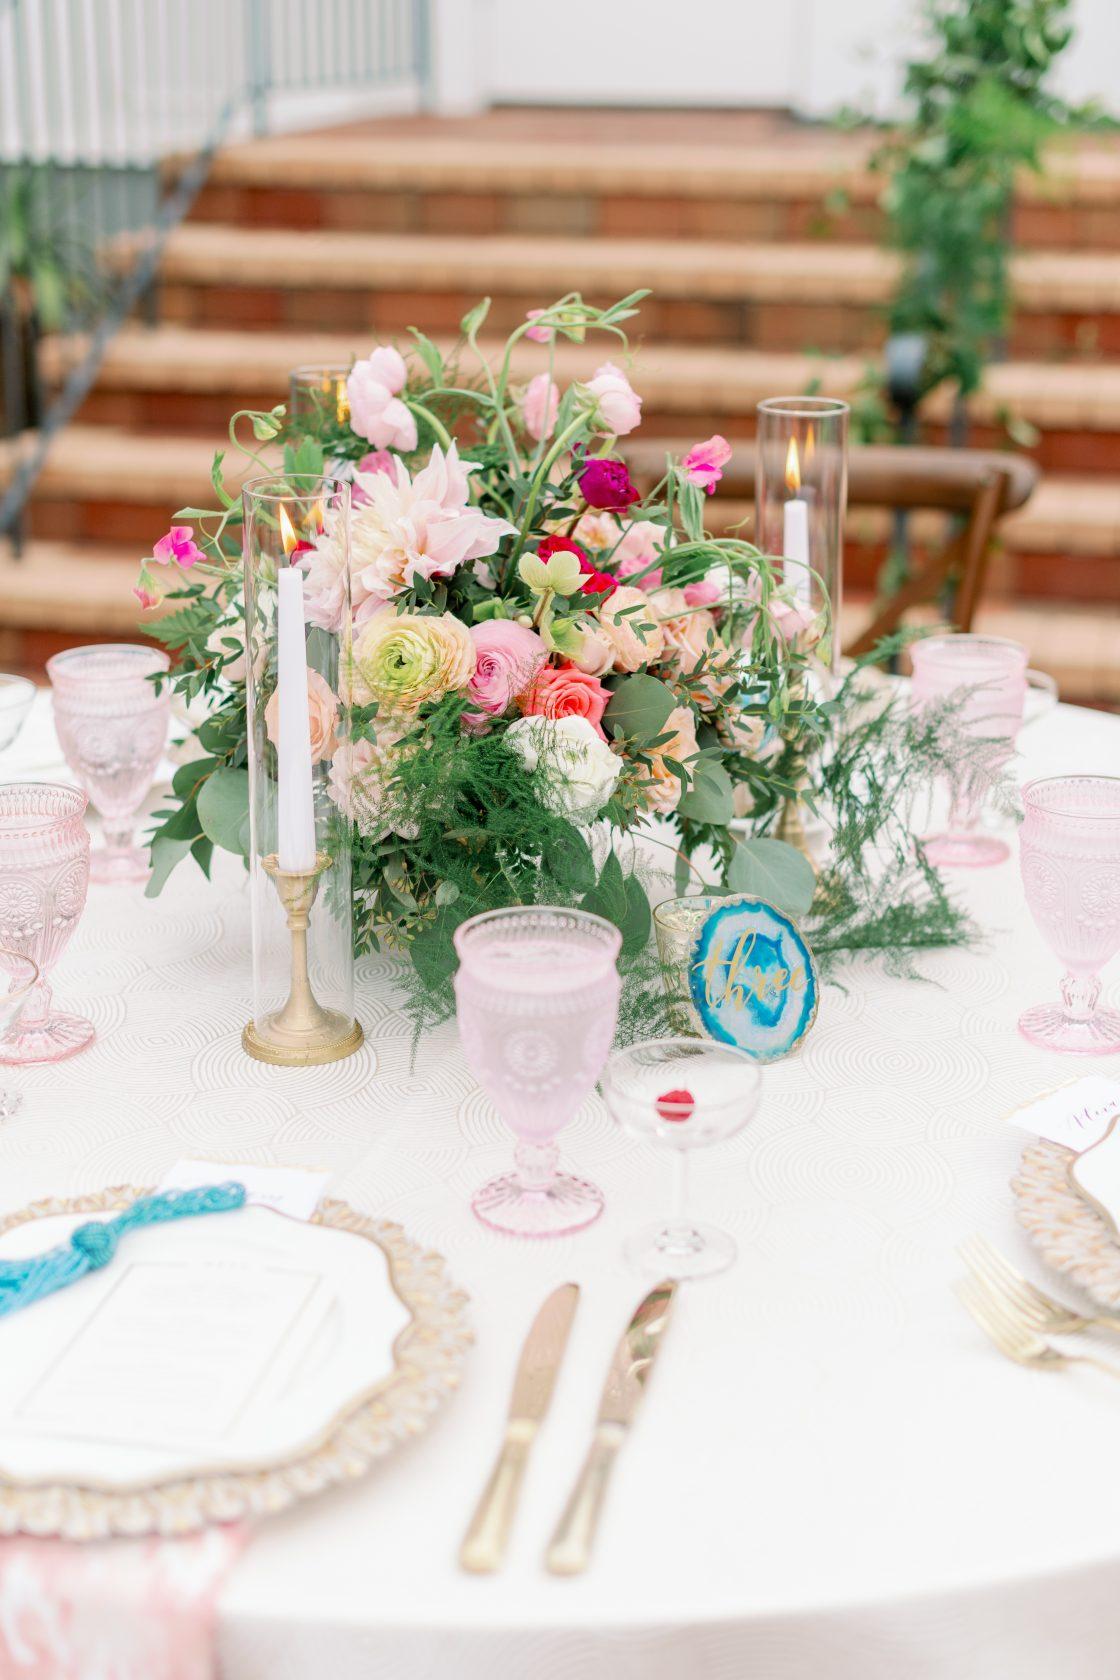 Ranunculus Dahlia Wedding Centerpiece